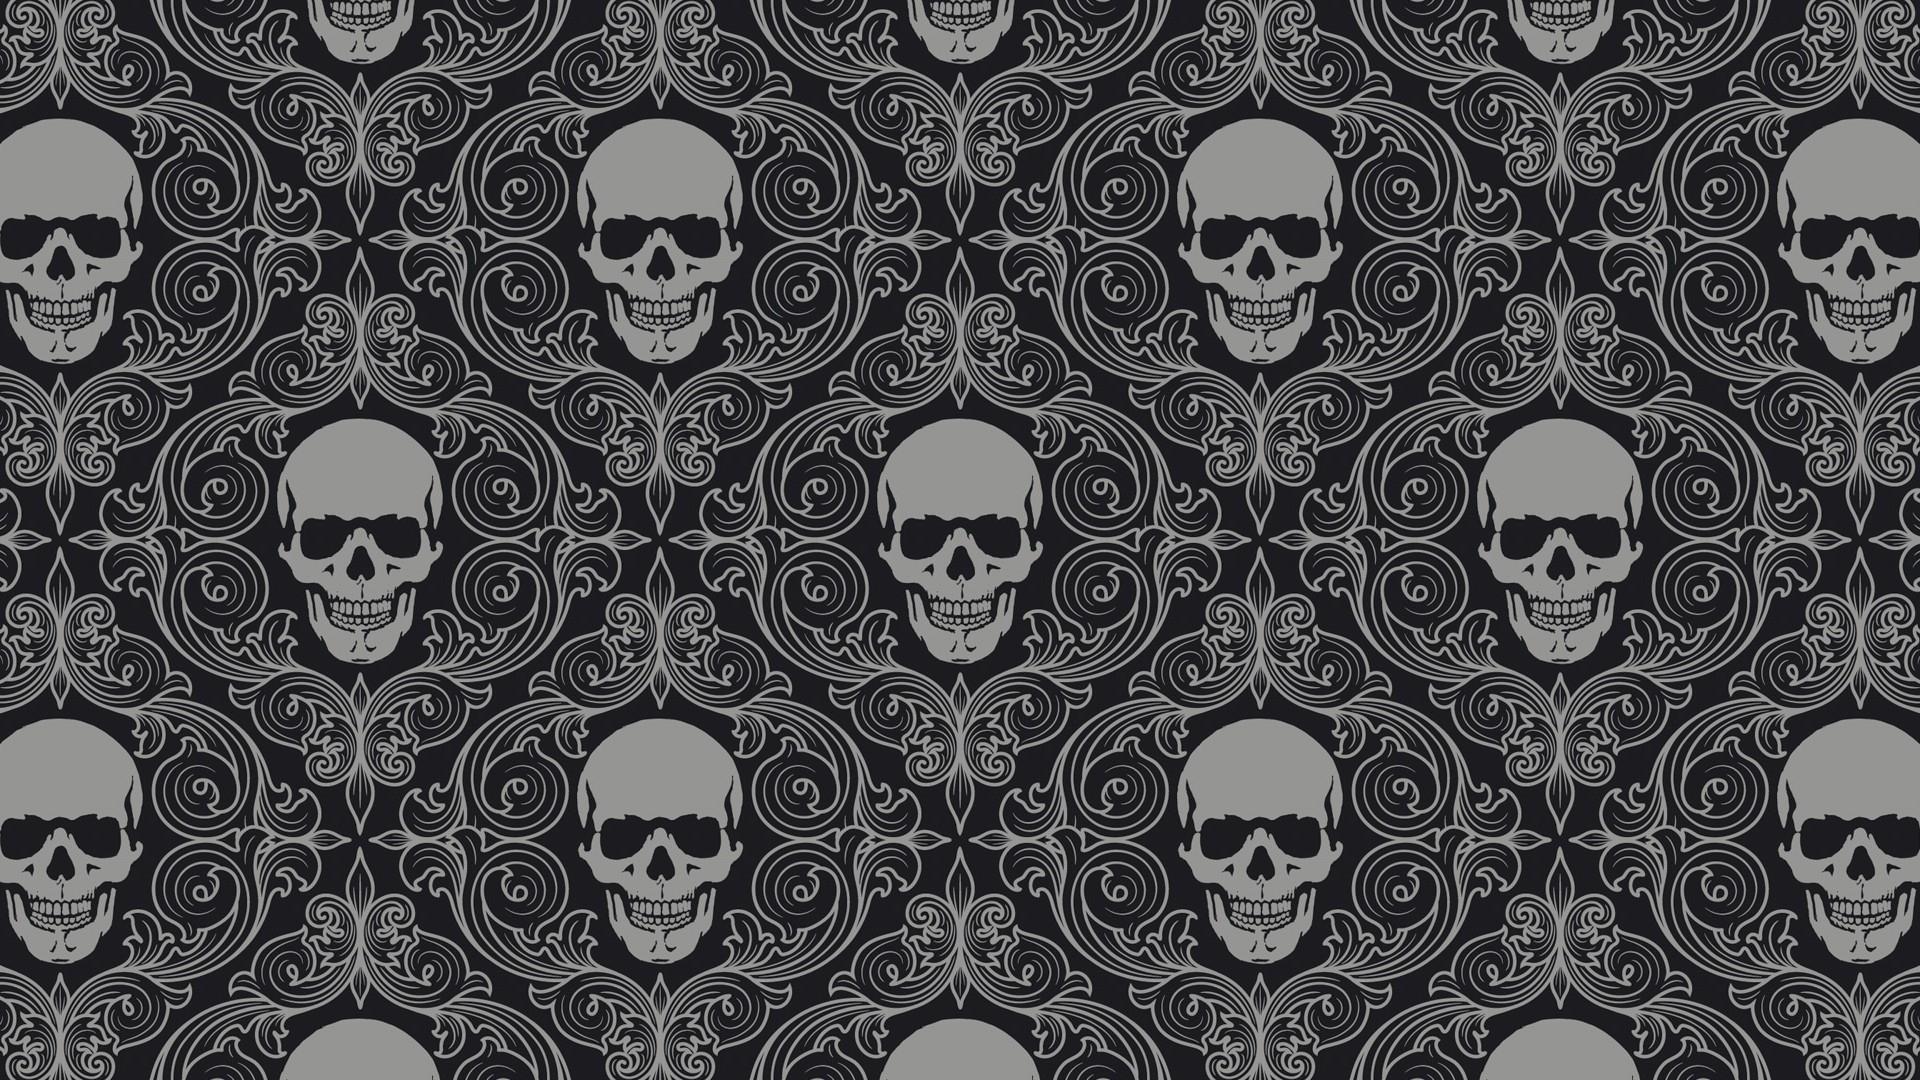 Skull Tiles Background HD Artist 4k Wallpapers Images